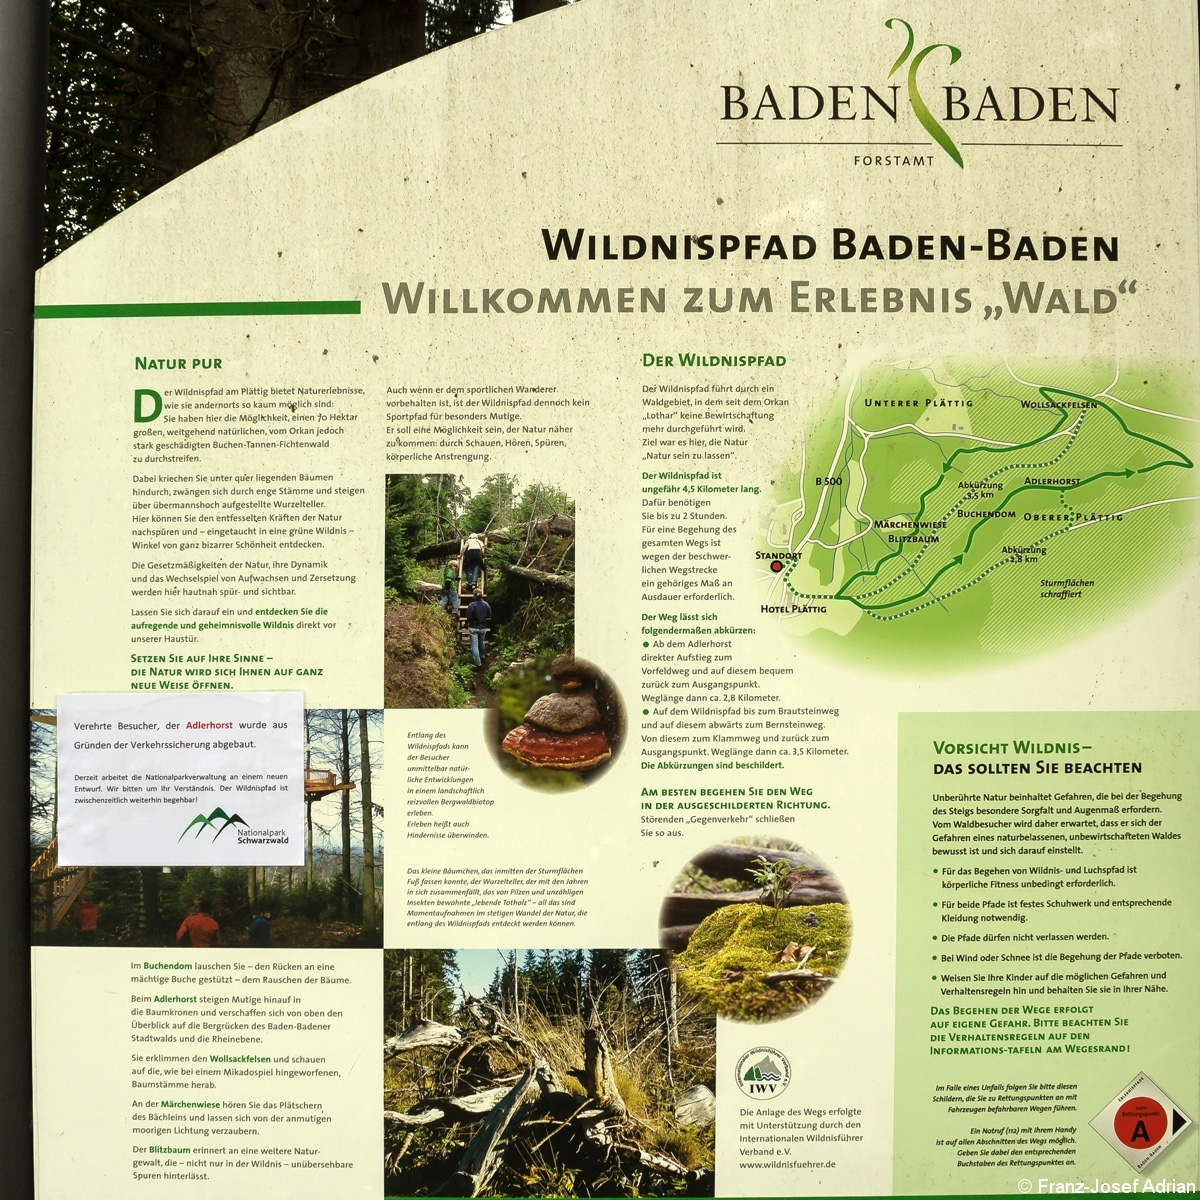 Wildnispfad